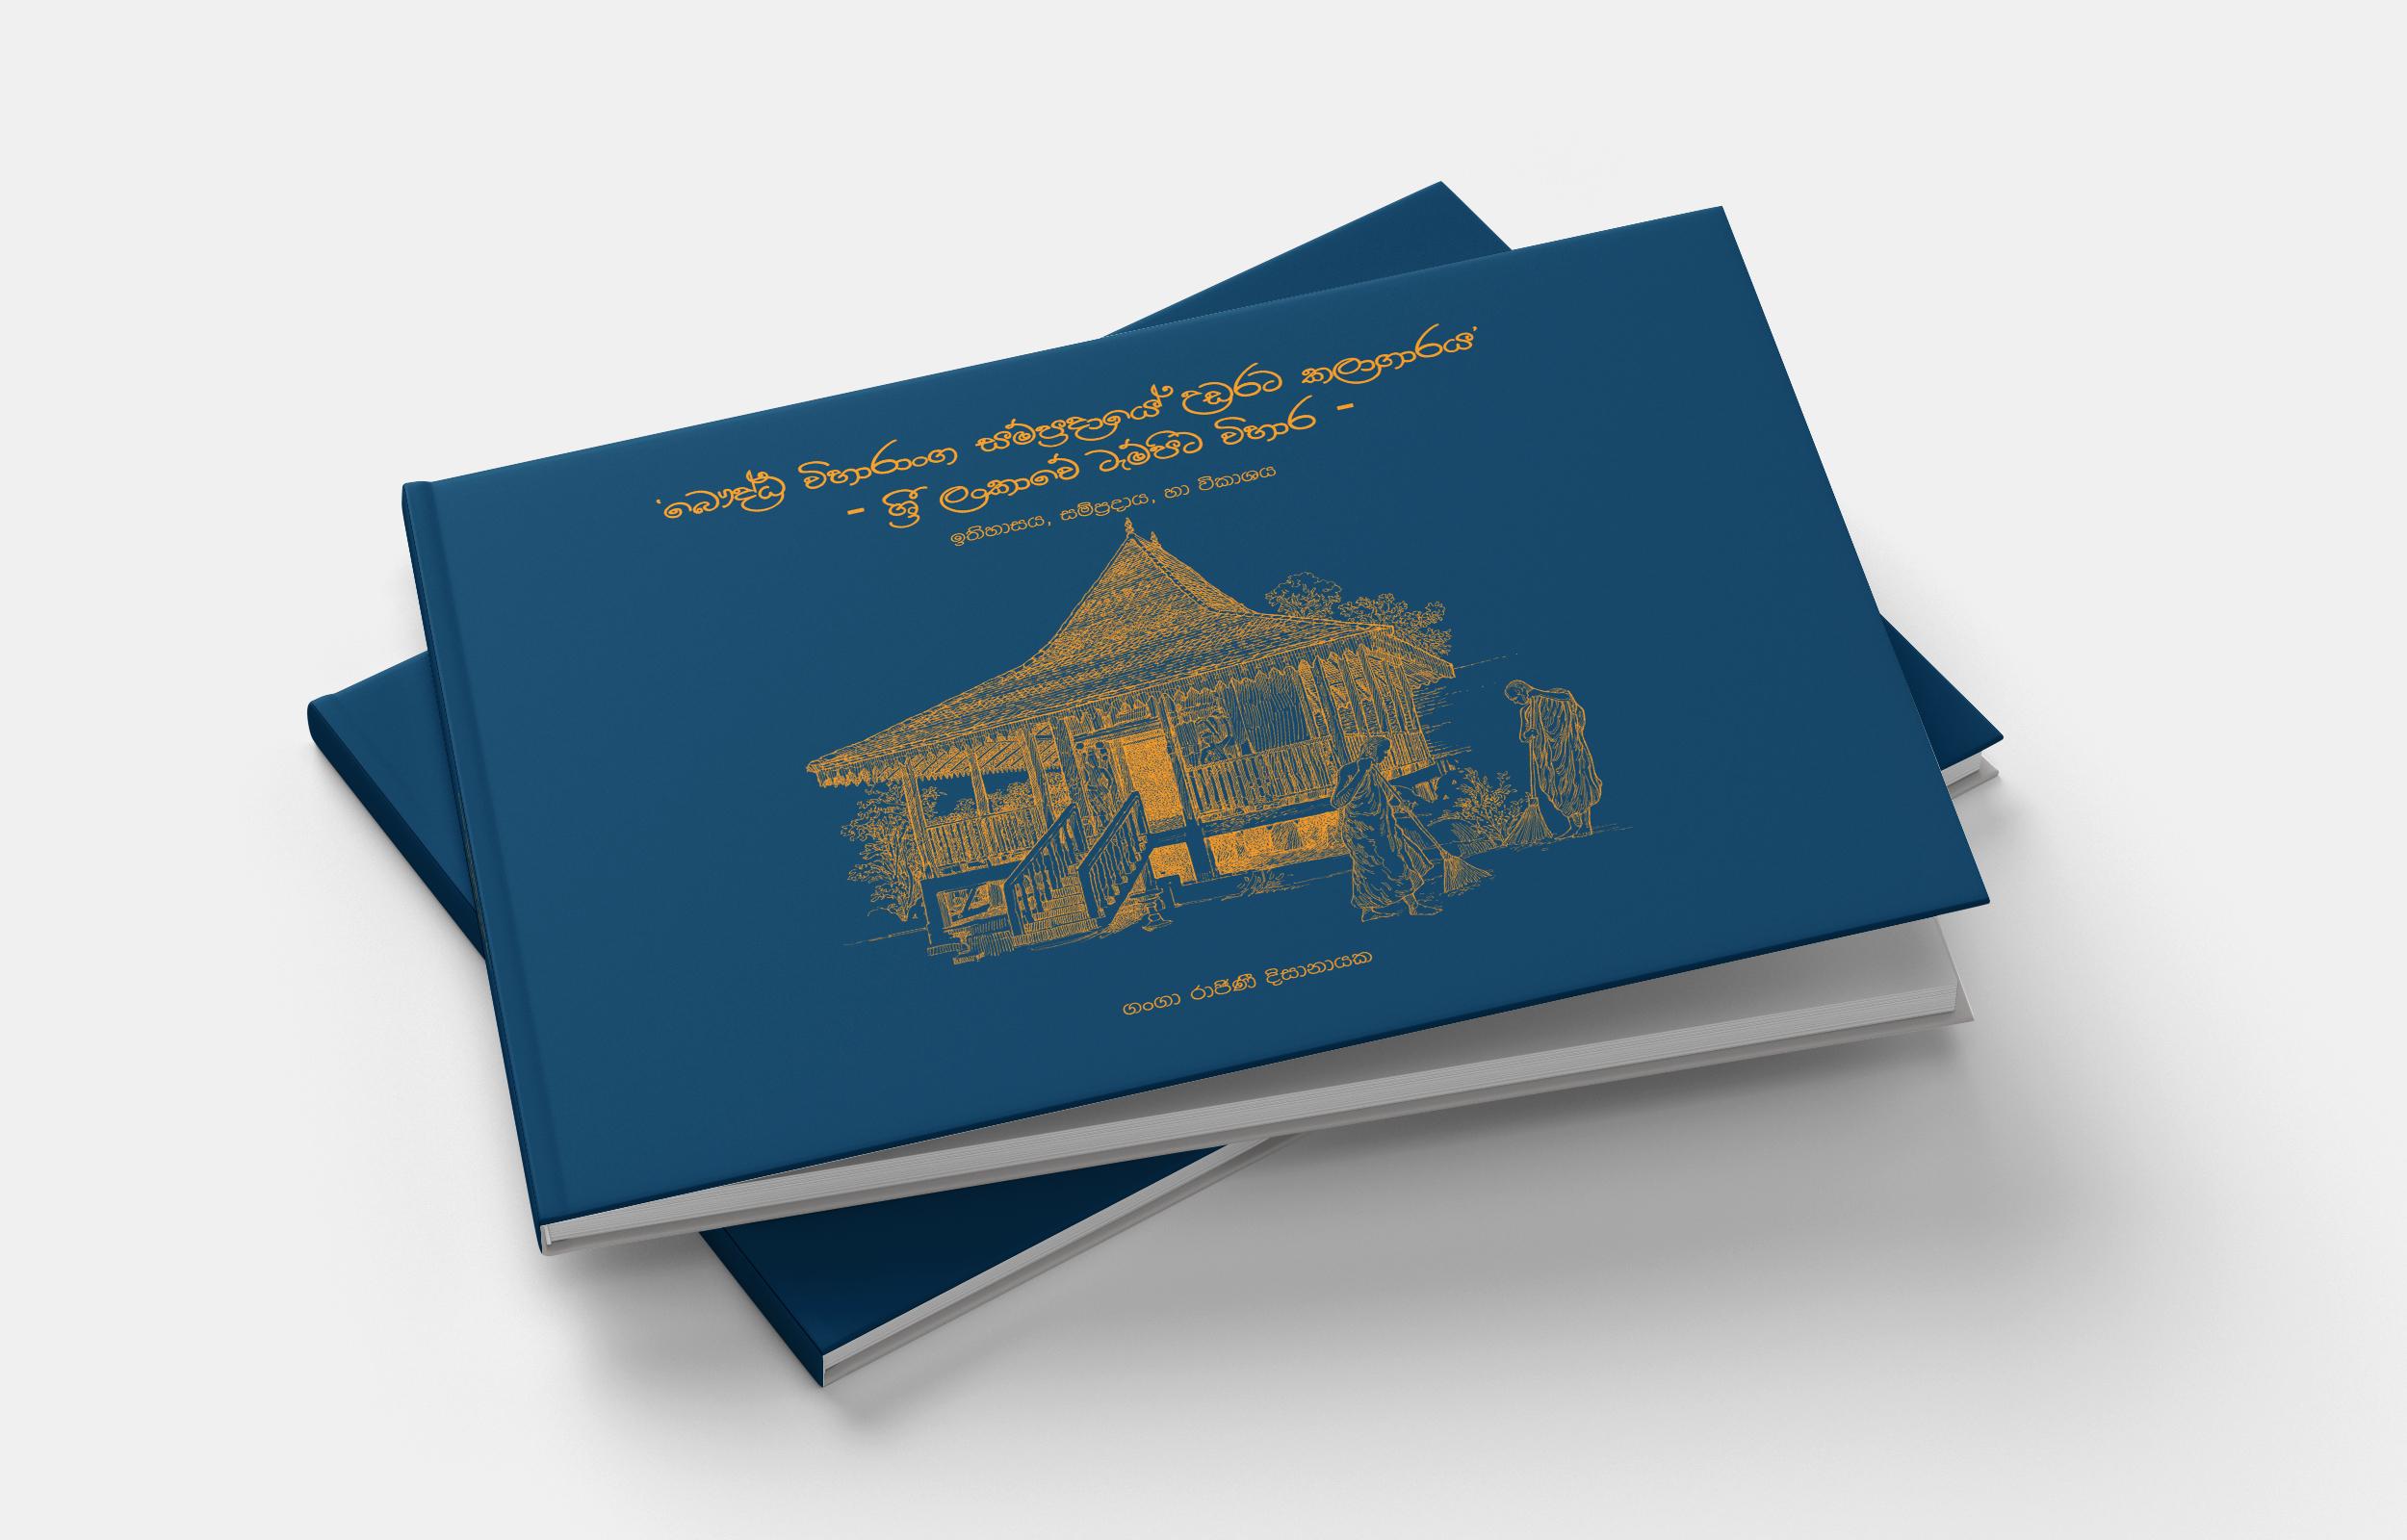 Bauddha Viharanga Sampradaye Udarata Kalagaraya- Sri Lankawe Tempita Viharaya